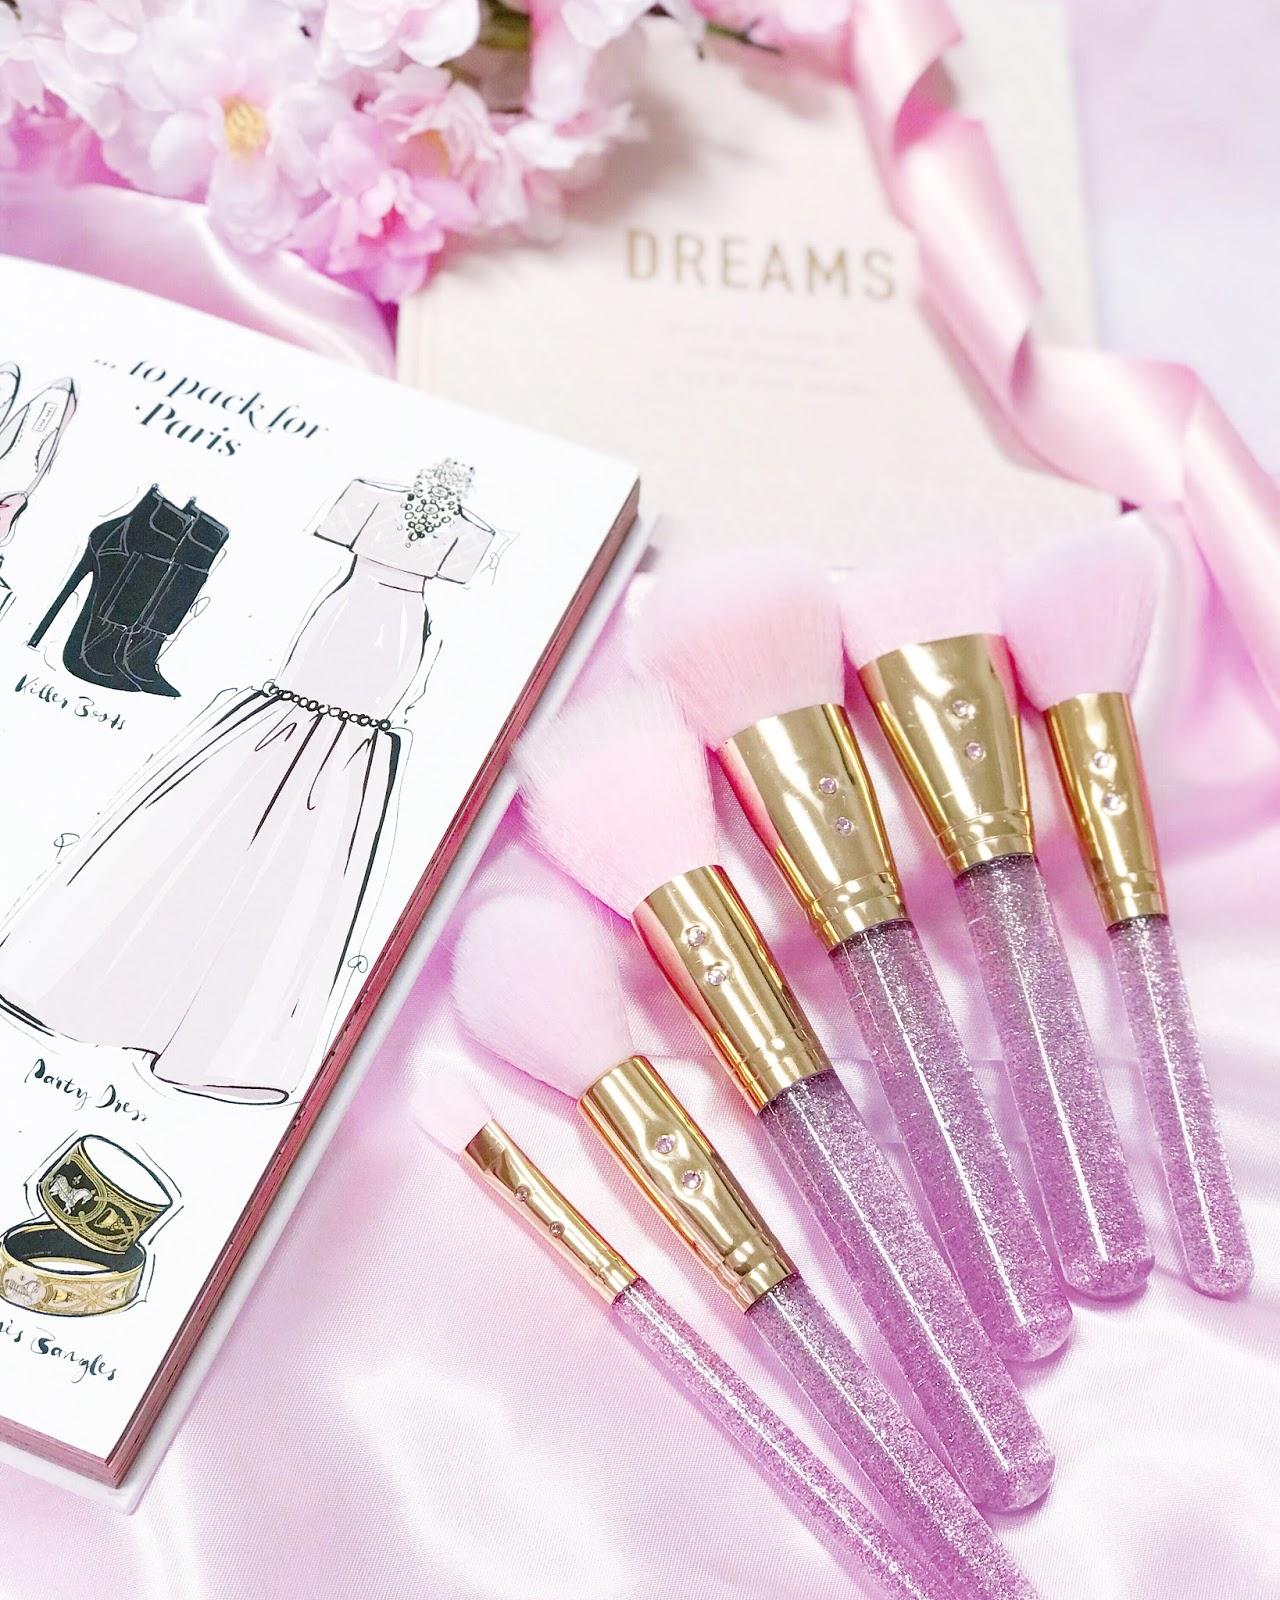 Pretty Pink Princess Makeup Brushes